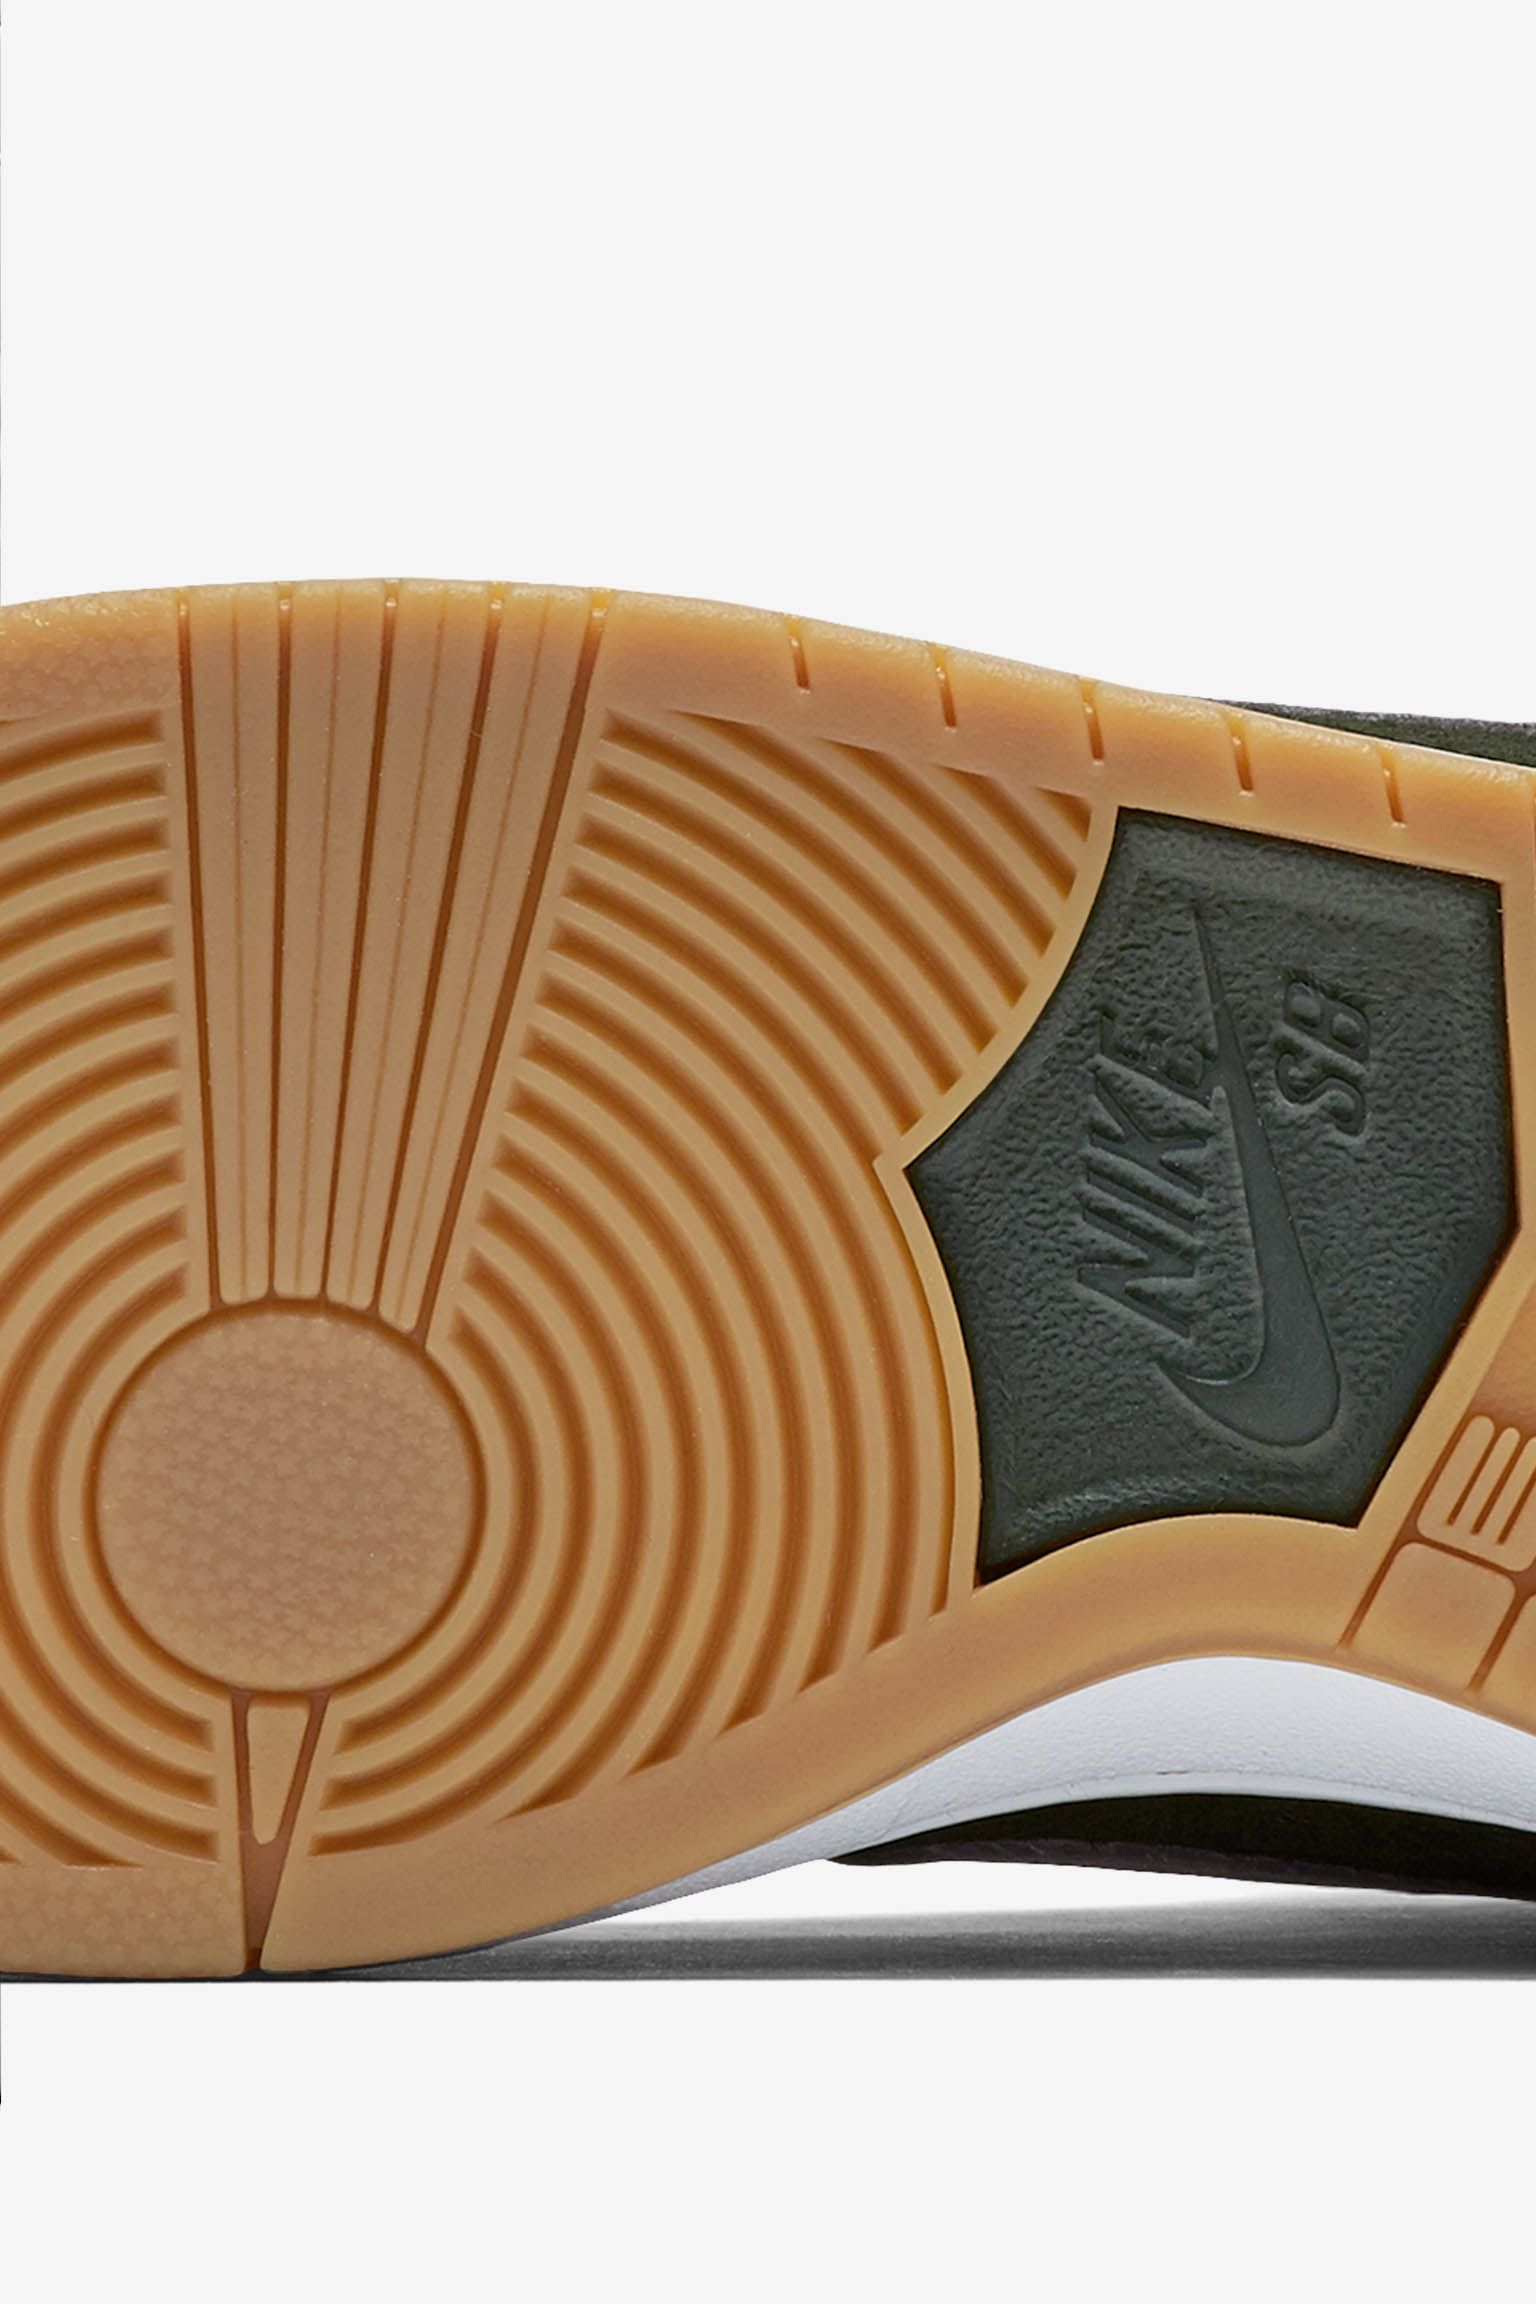 Nike SB Dunk High Premium 'Homegrown'